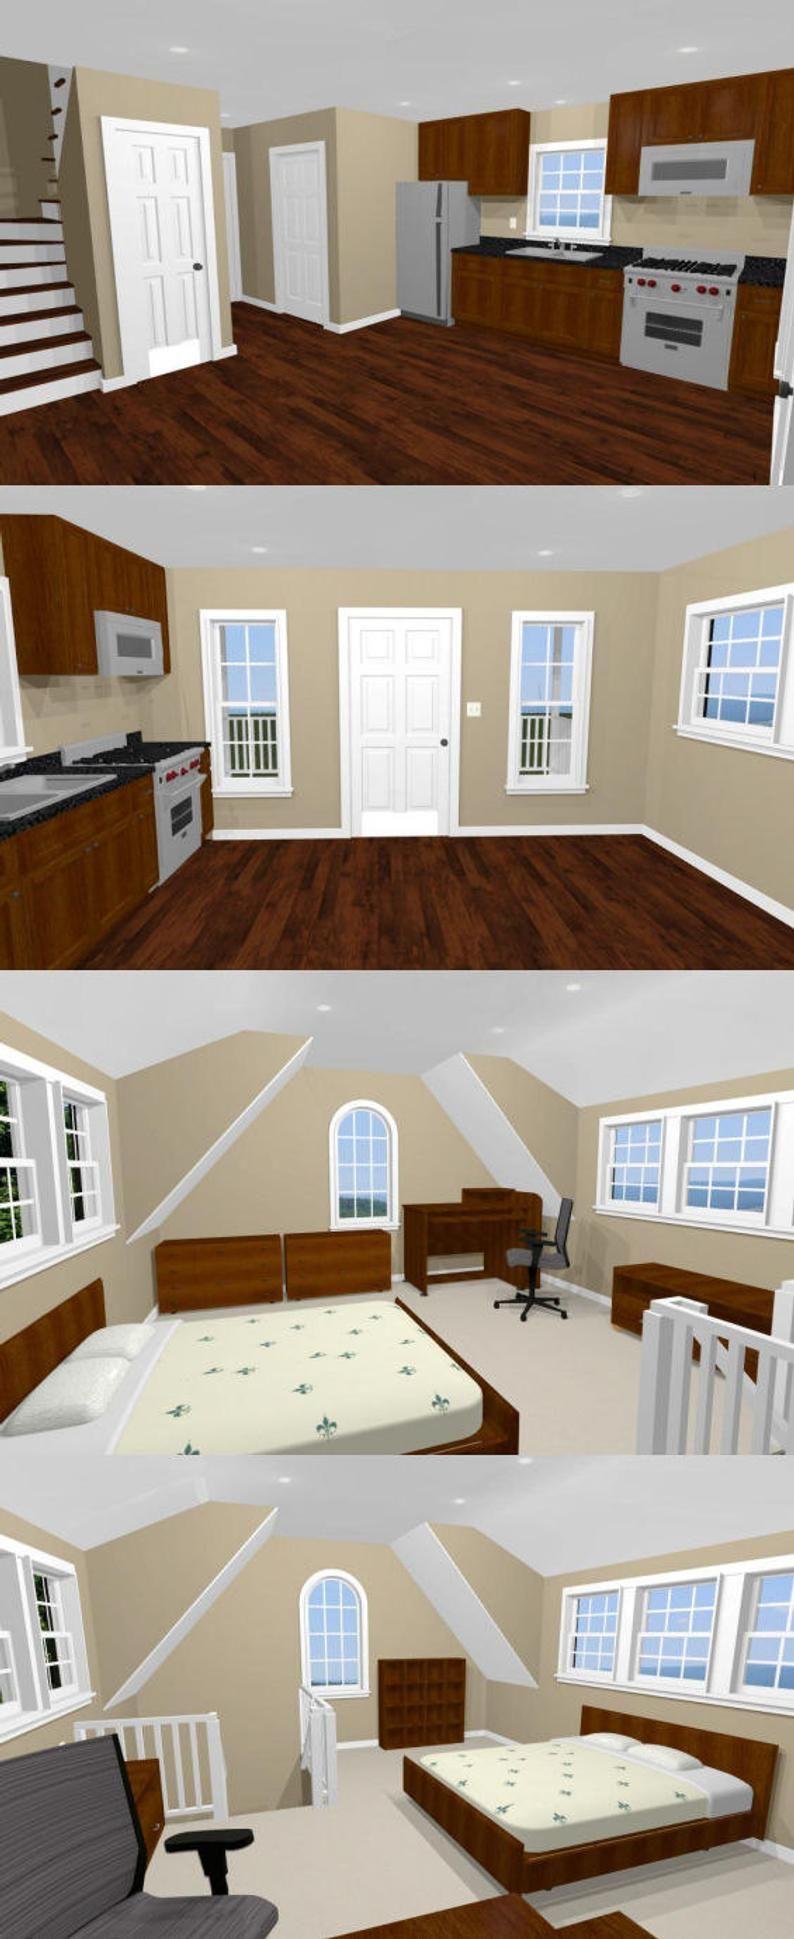 16x20 House 1Bedroom 1Bath 574 sq ft PDF Floor